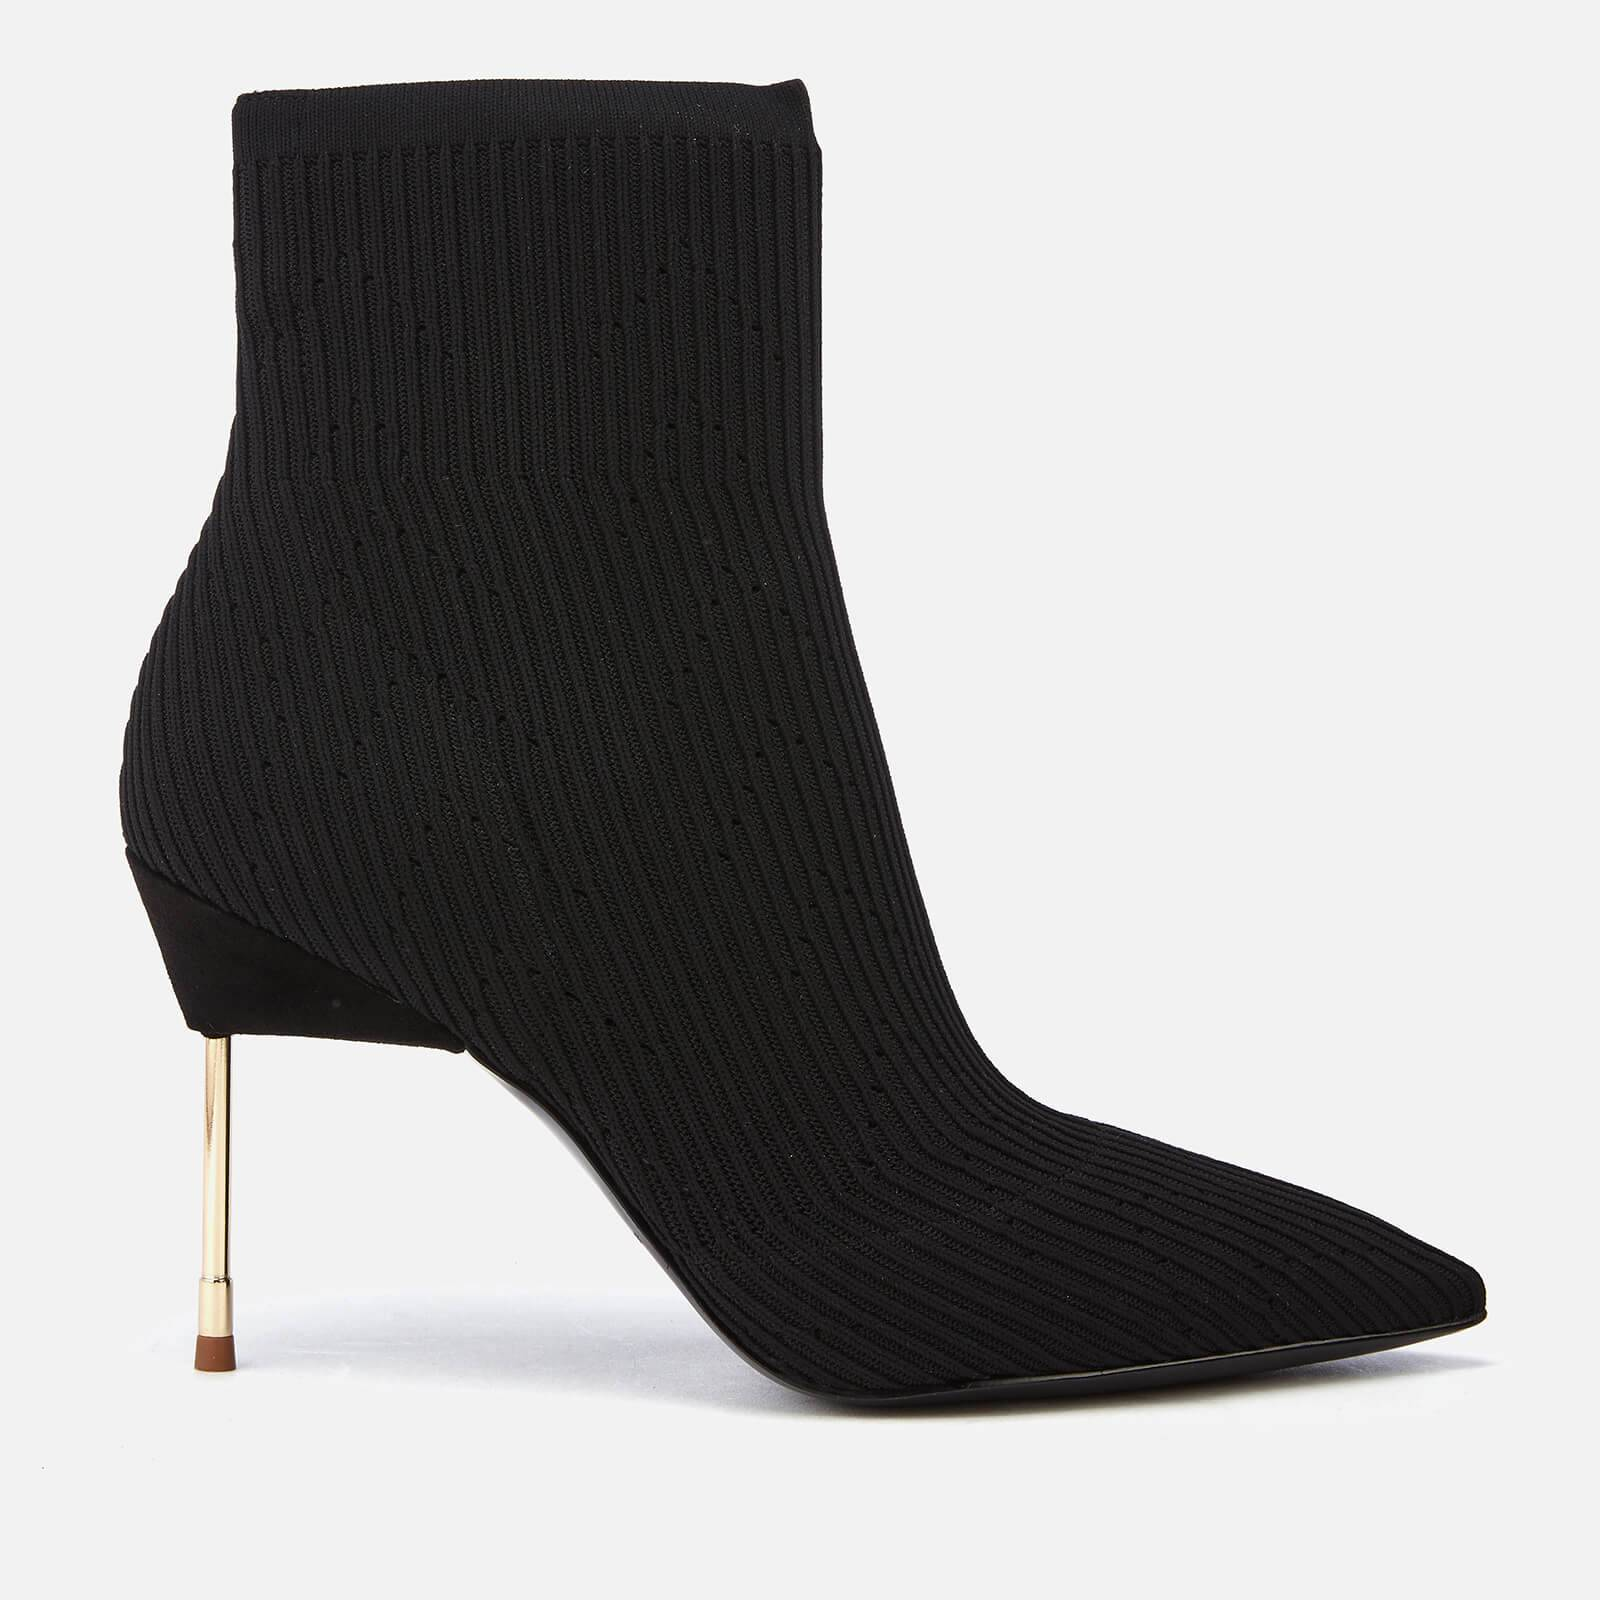 Kurt Geiger London Women's Barbican Stretch Heeled Ankle Boots - Black - UK 7